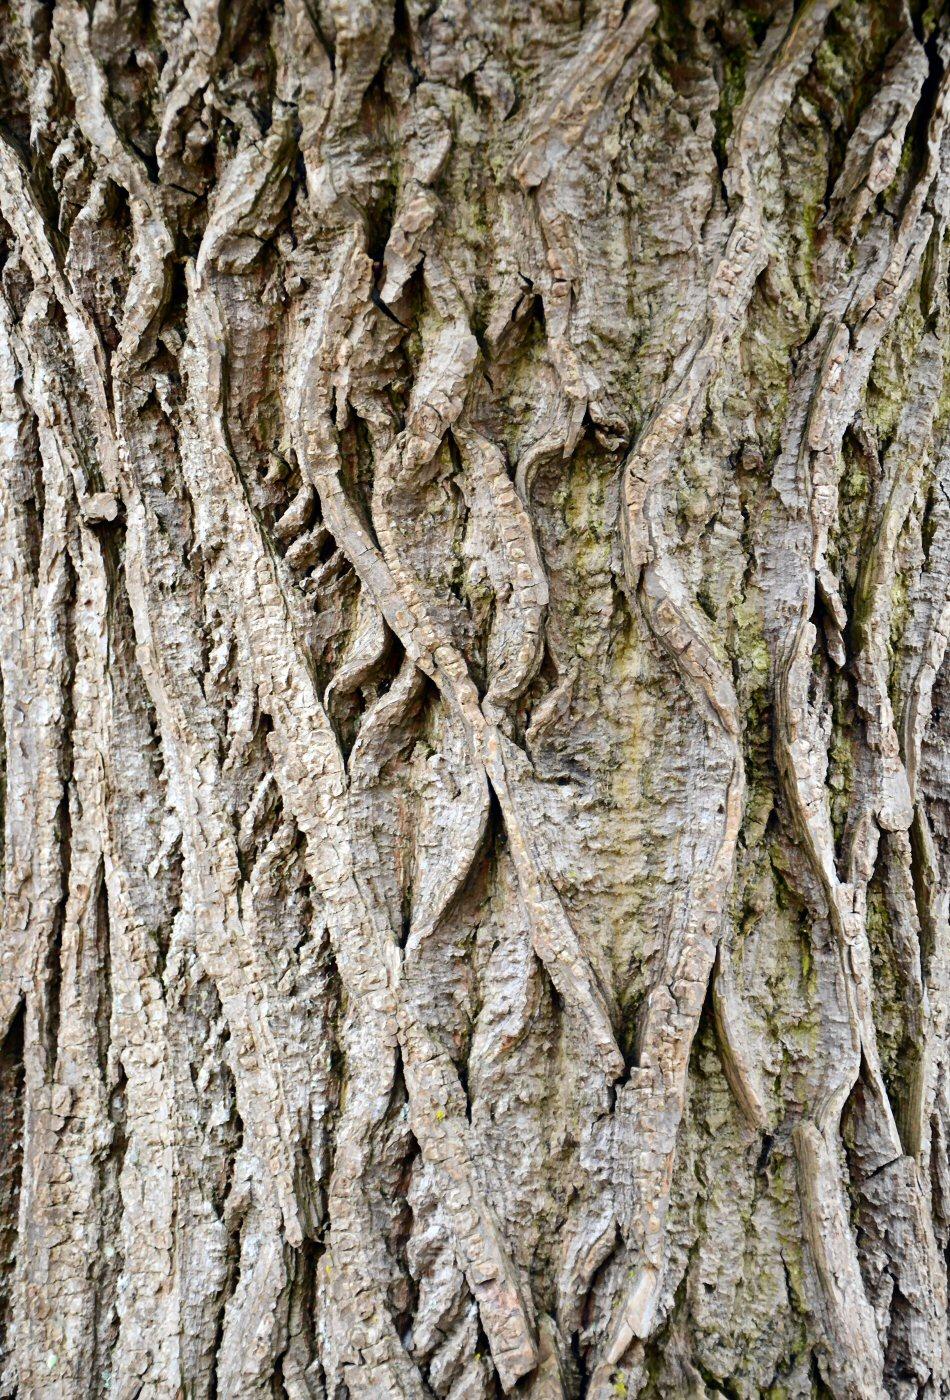 Ecorce d'arbre (orne)